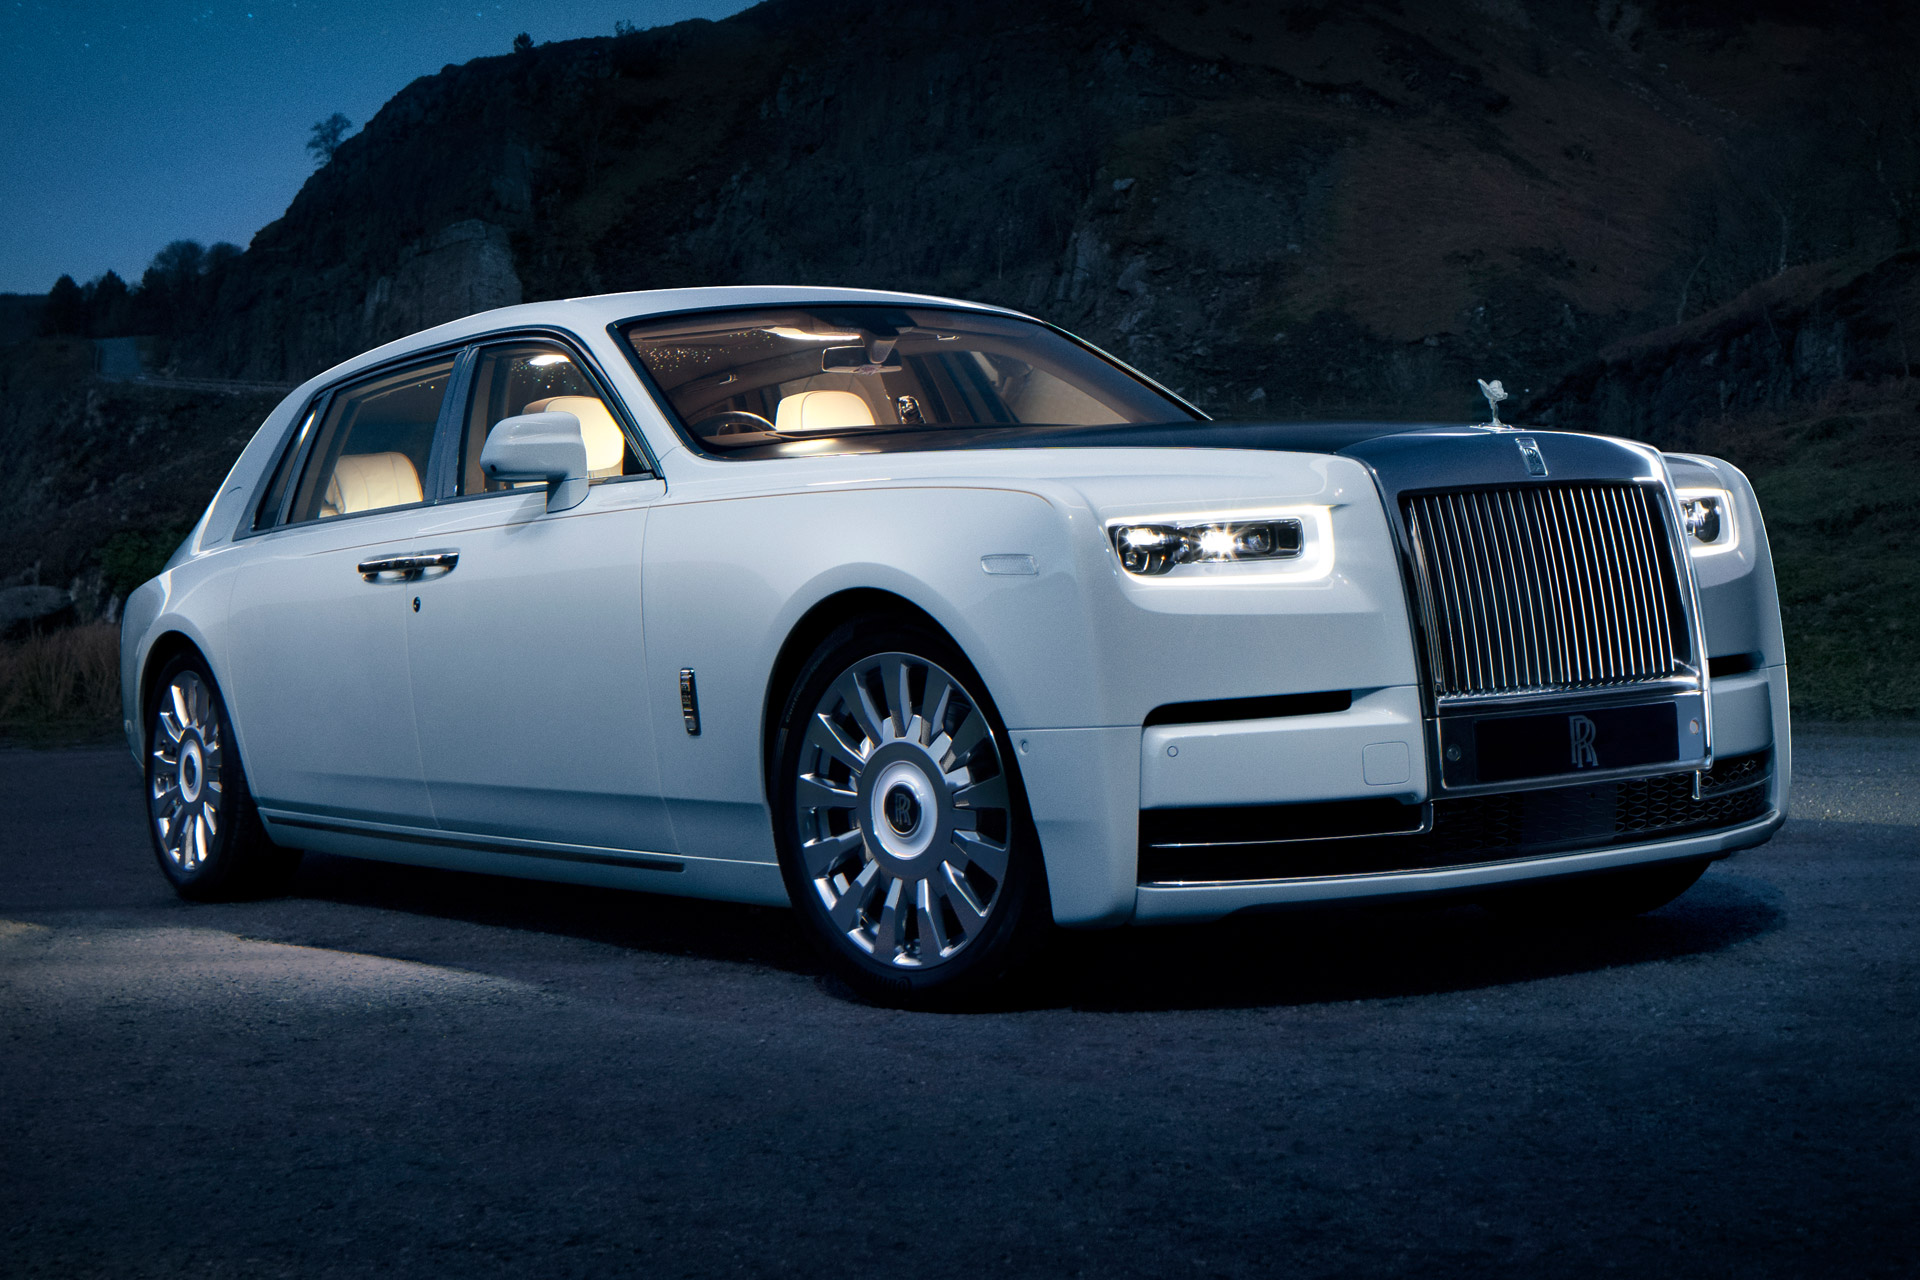 2019 Rolls-Royce Phantom Tranquillity Sedan